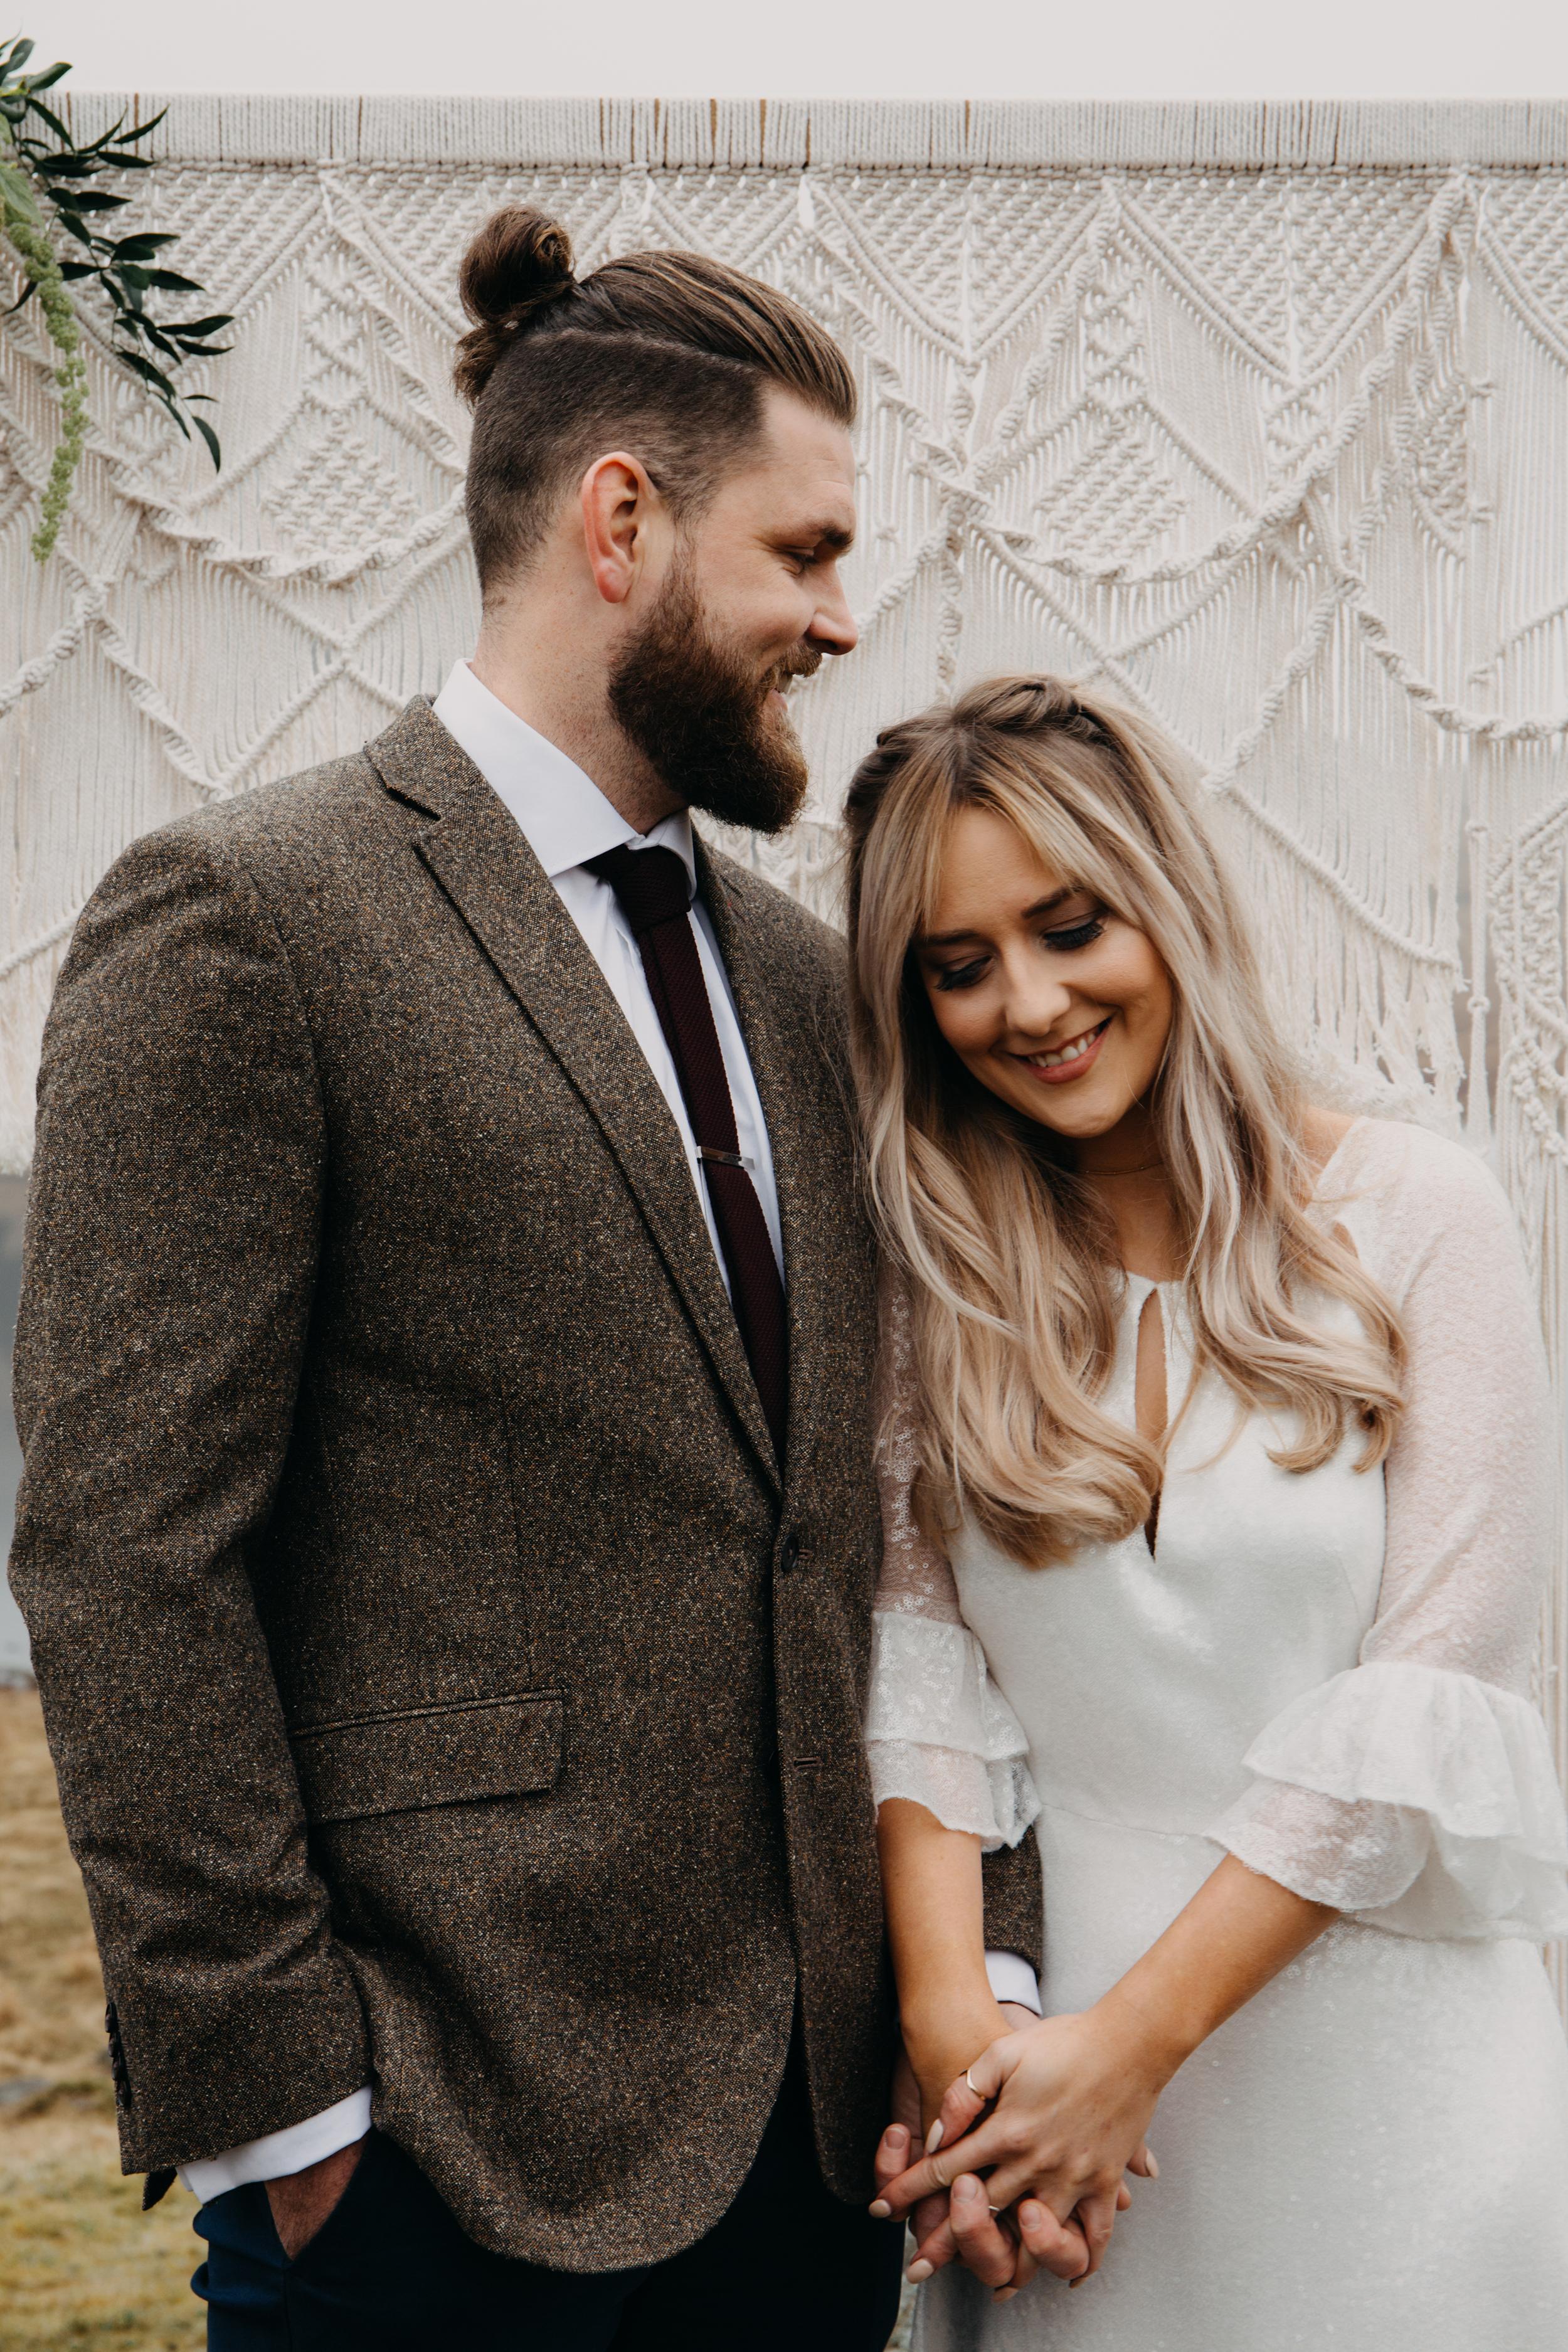 lancashire-wedding-photographer-sarah-longworth.jpg